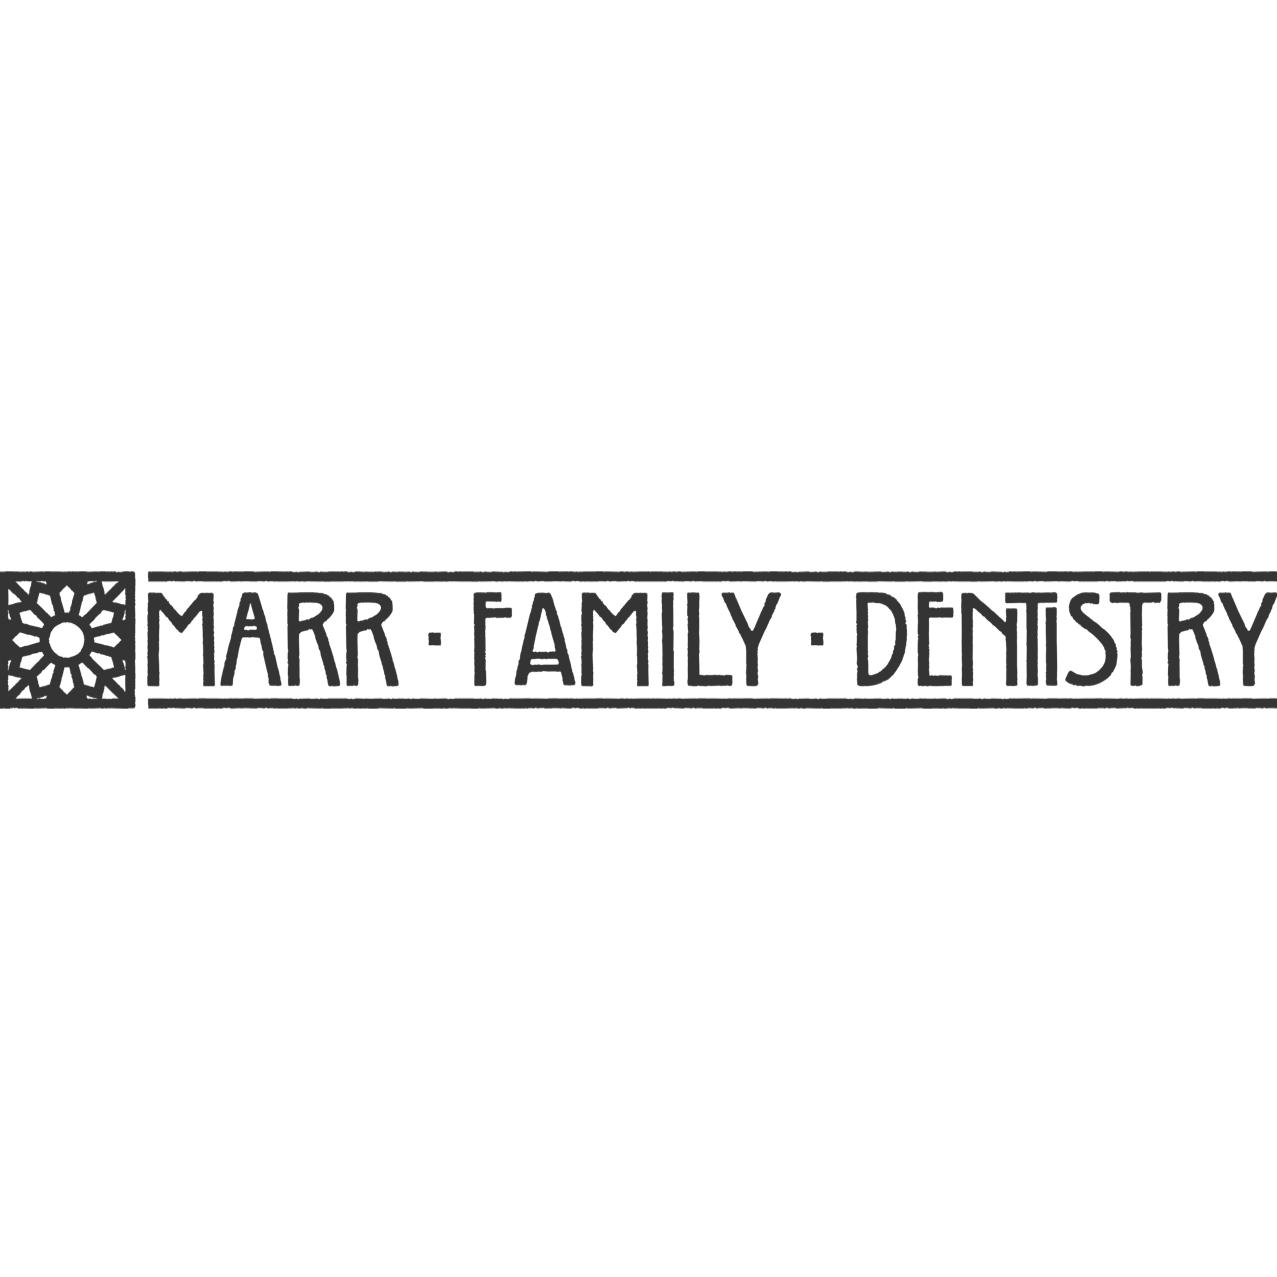 Marr Family Dentistry